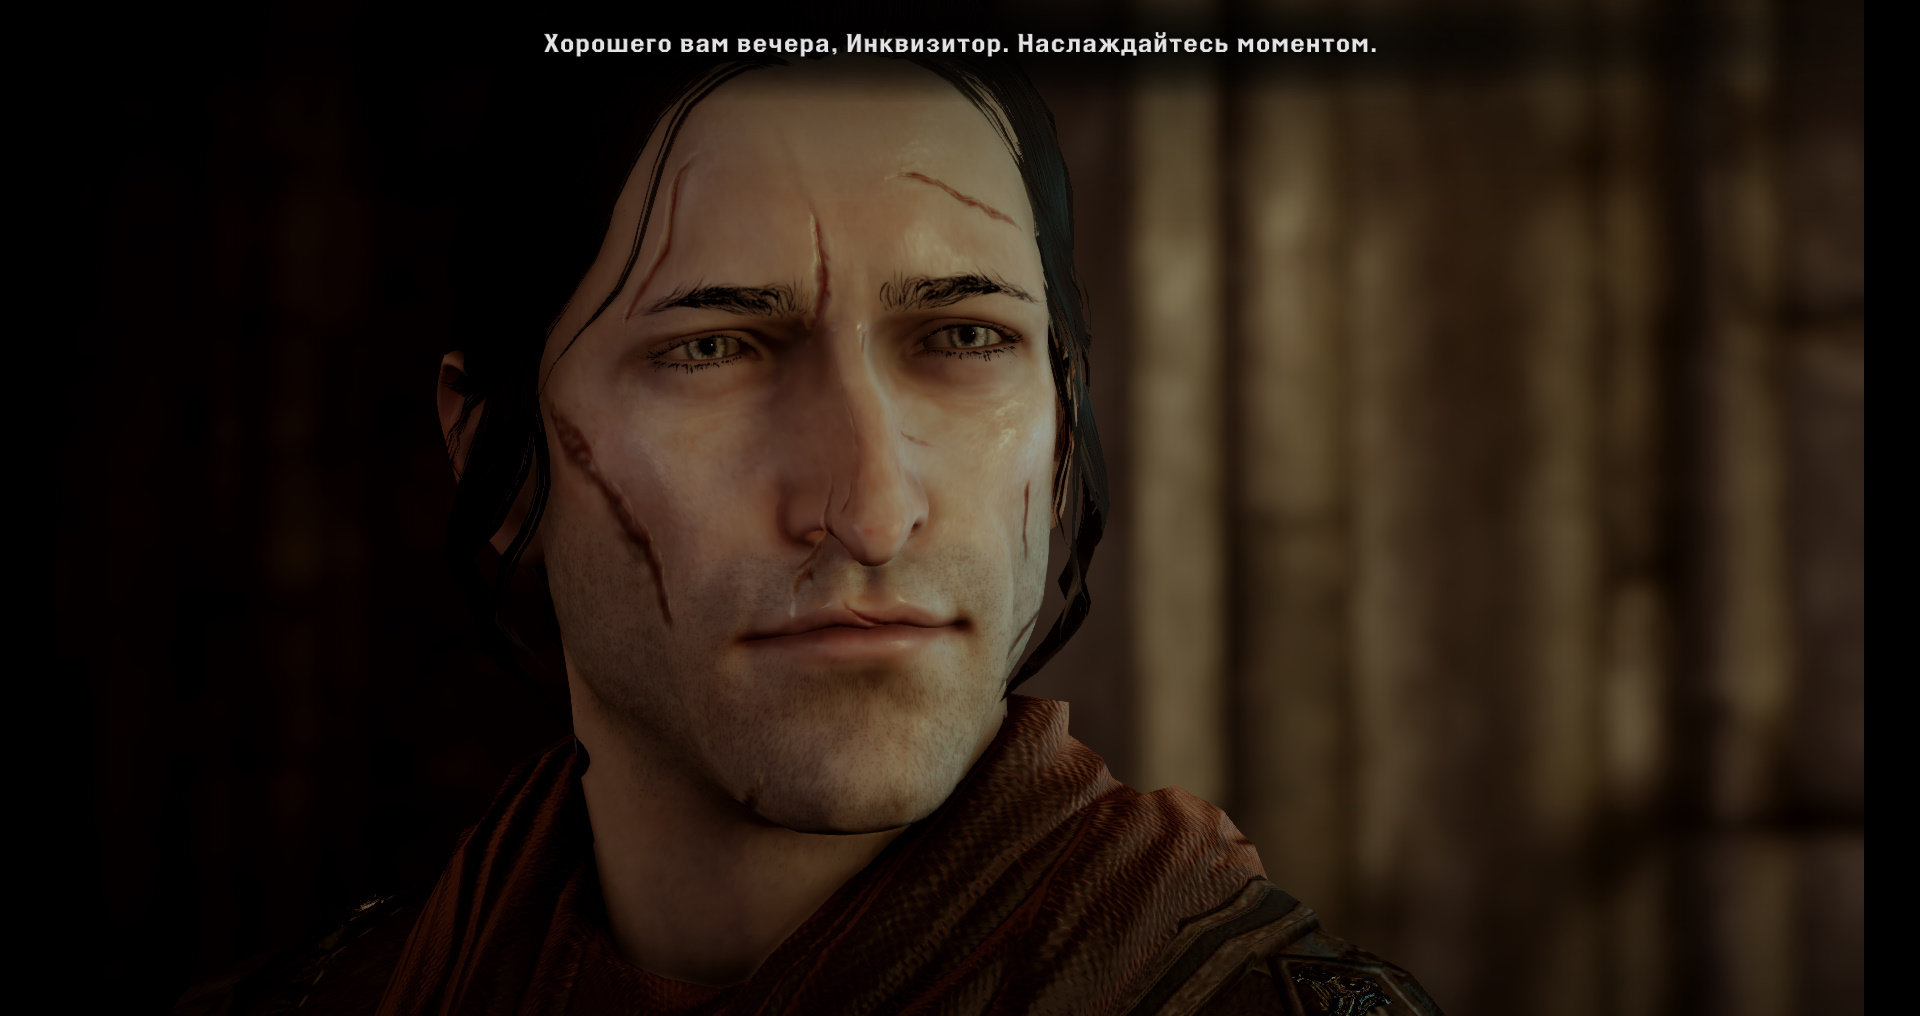 http://s8.uploads.ru/r5Jk2.jpg